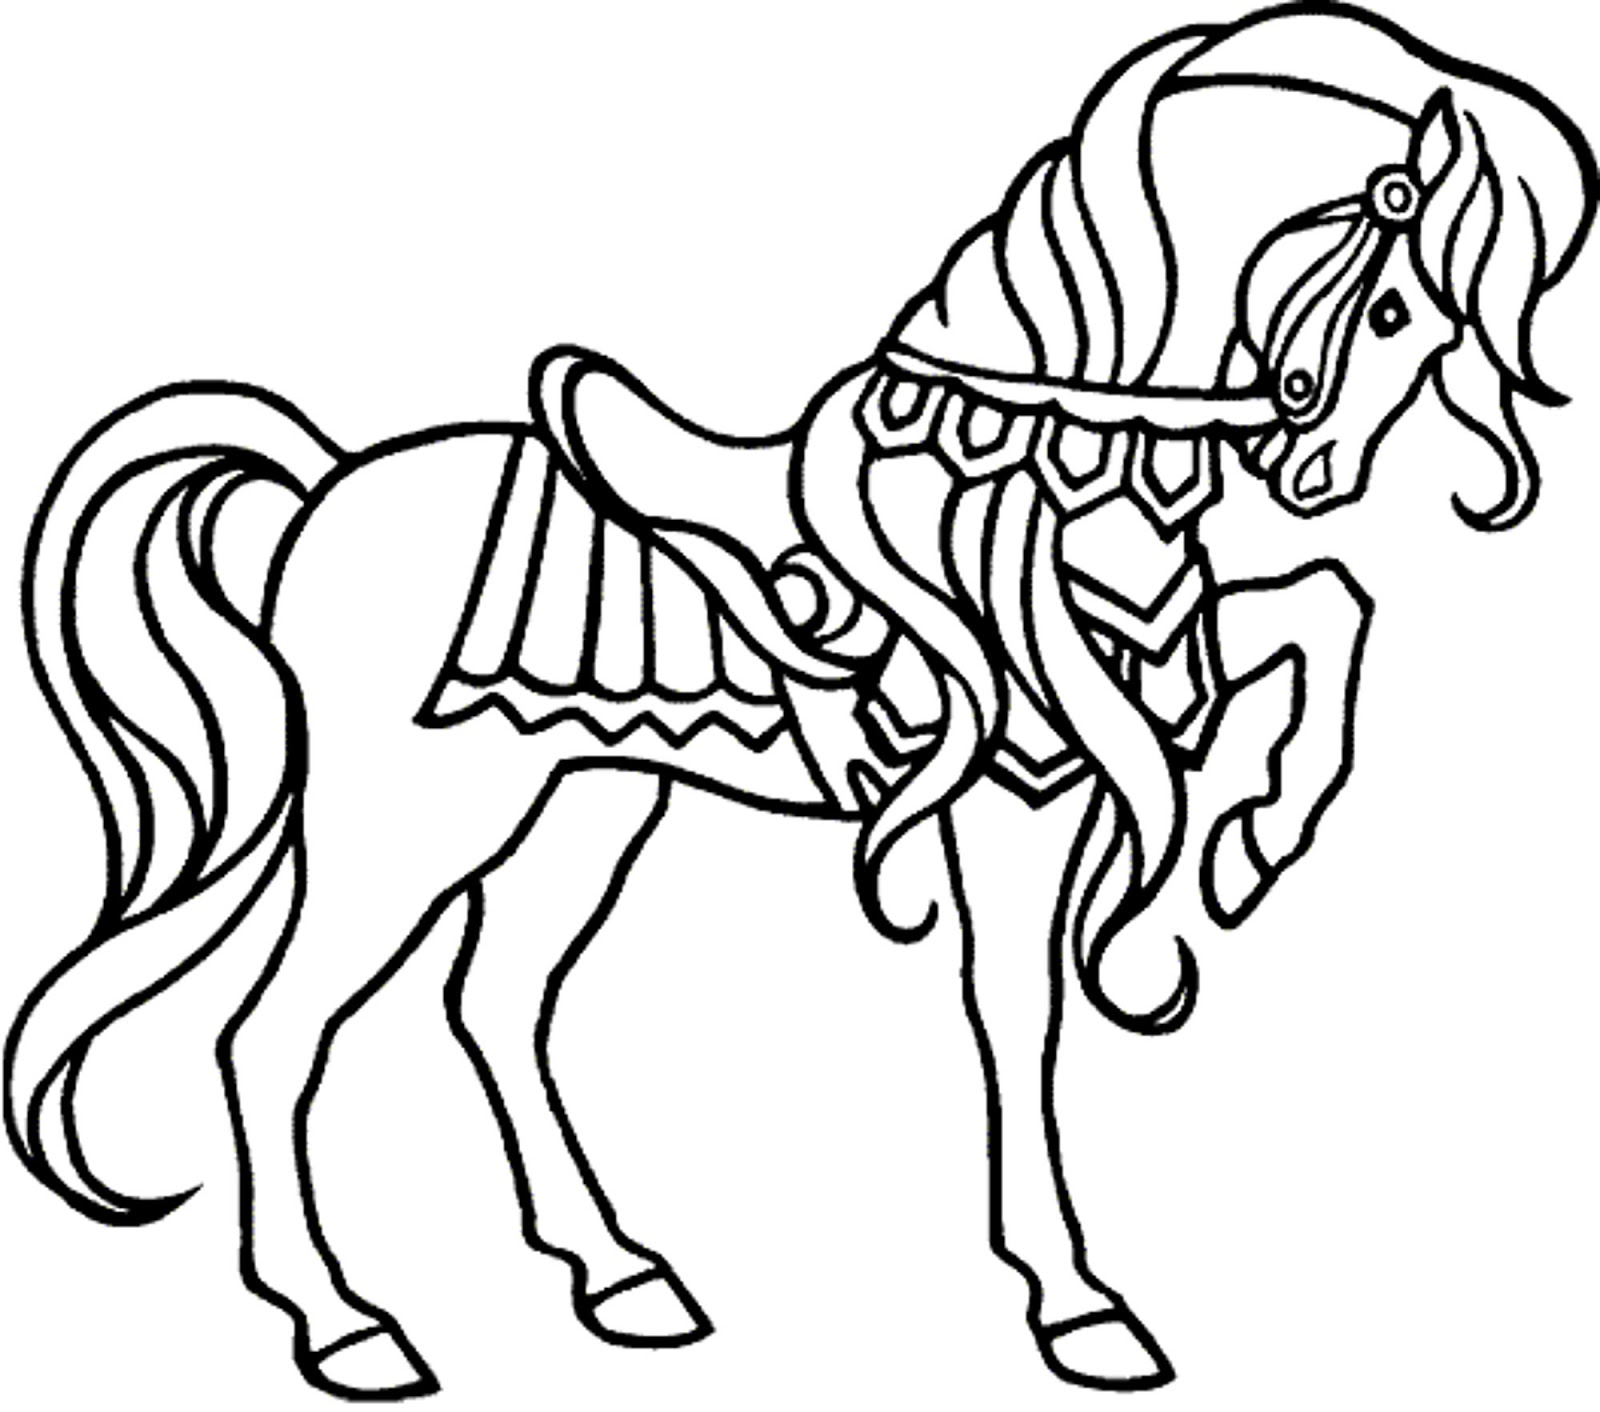 10 Mewarnai Gambar Kuda Pony Pemandangan Kartun Masjid